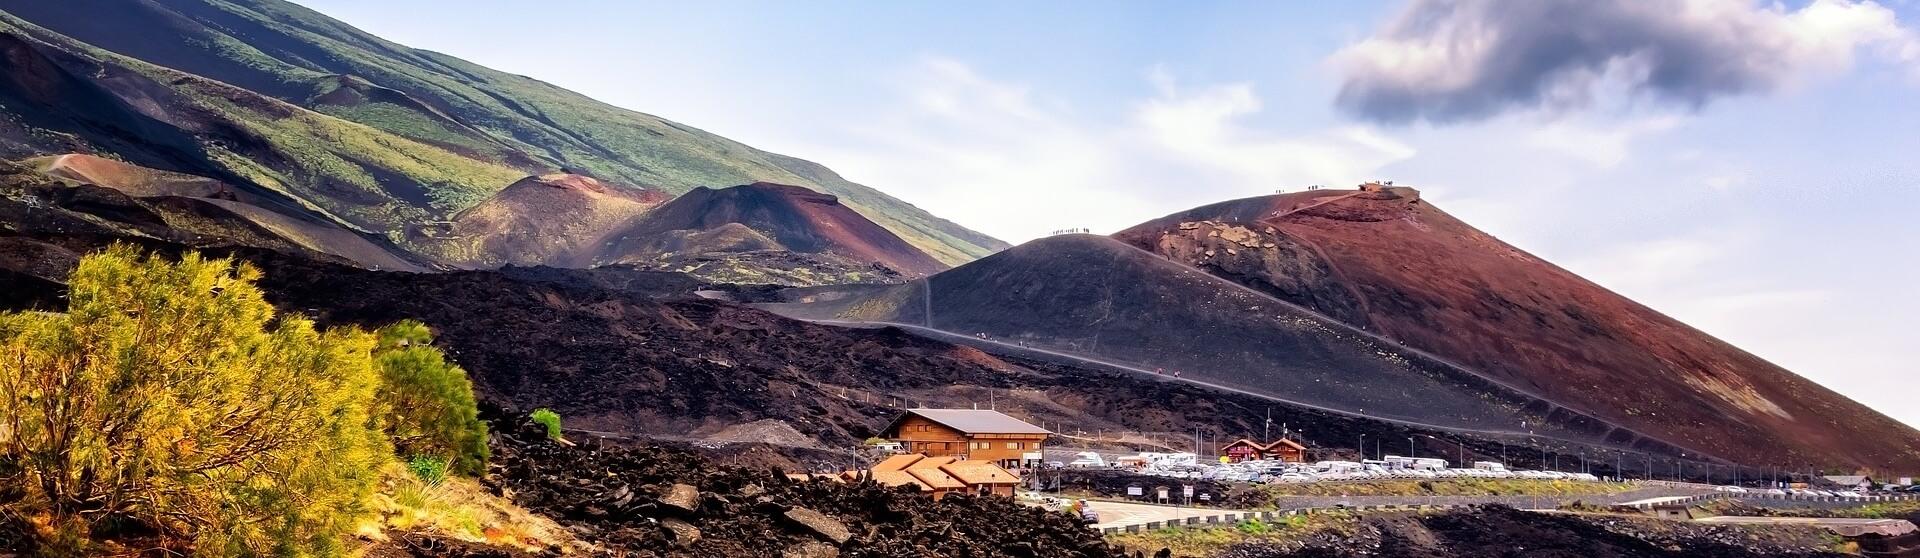 Escursioni trekking e tour in quad Etna